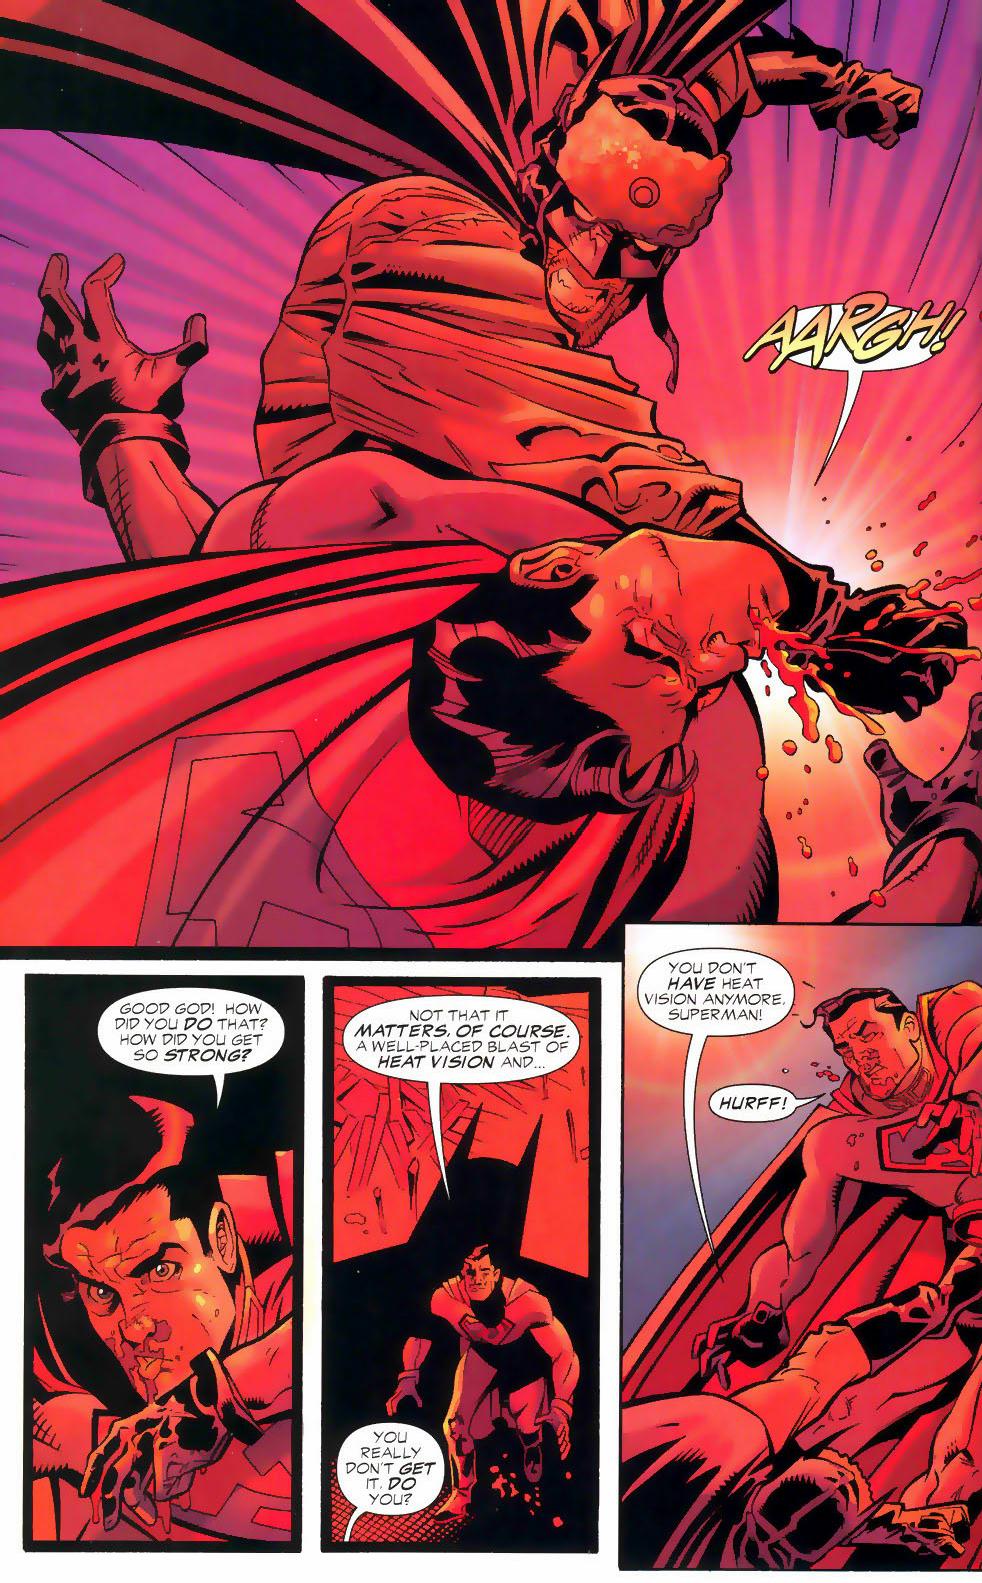 batman-vs-superman-red-son-2